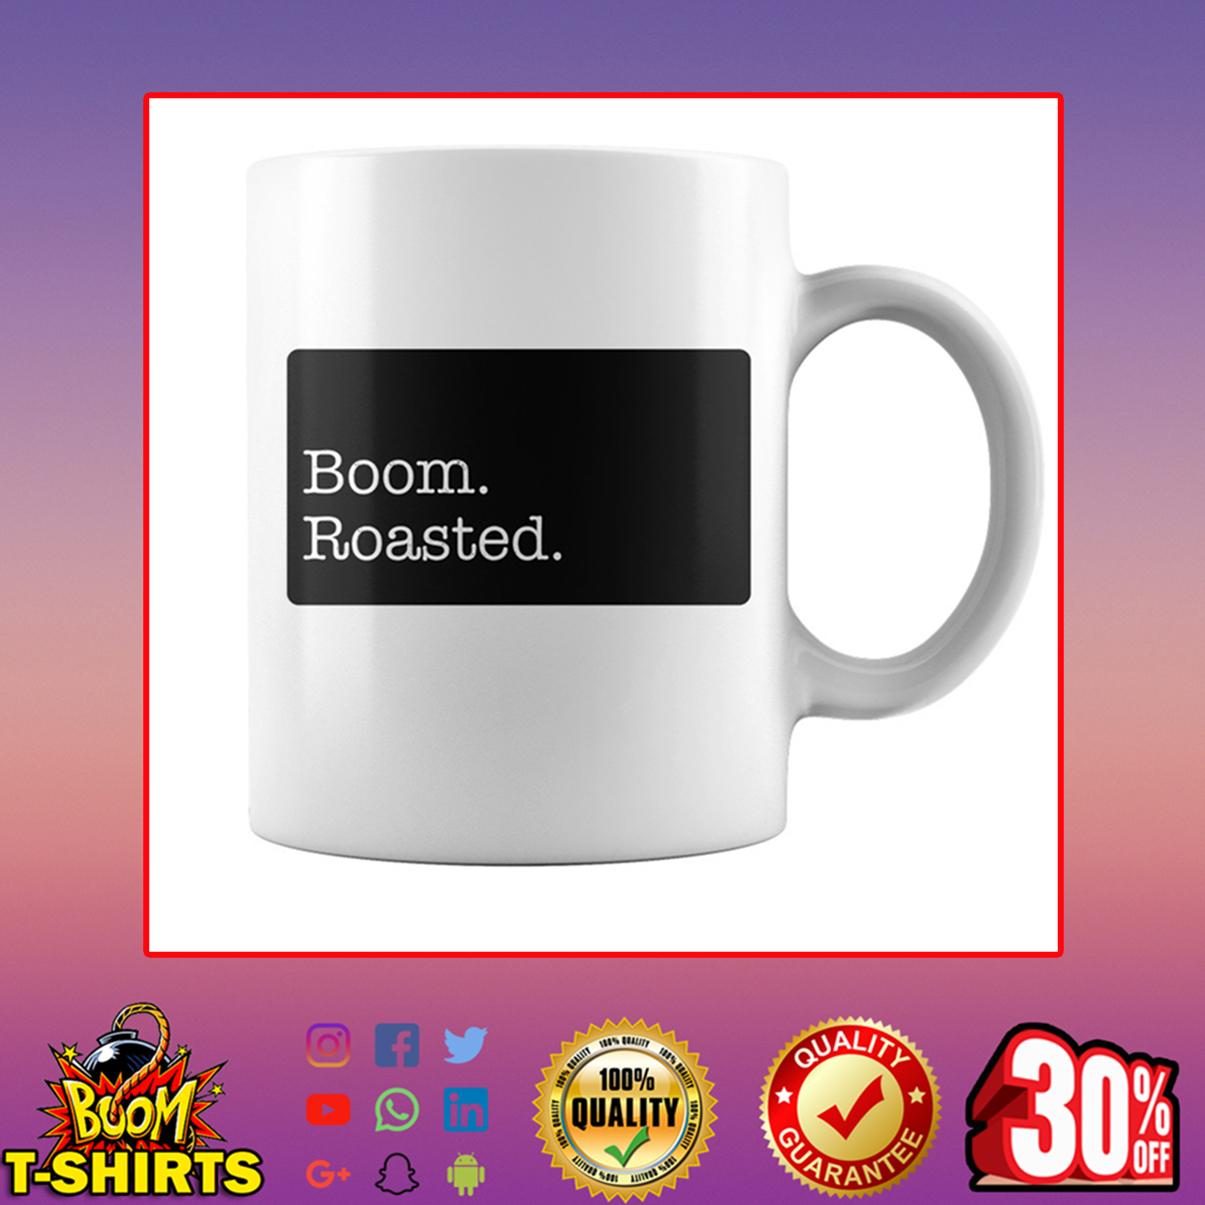 Boom roasted mug - white